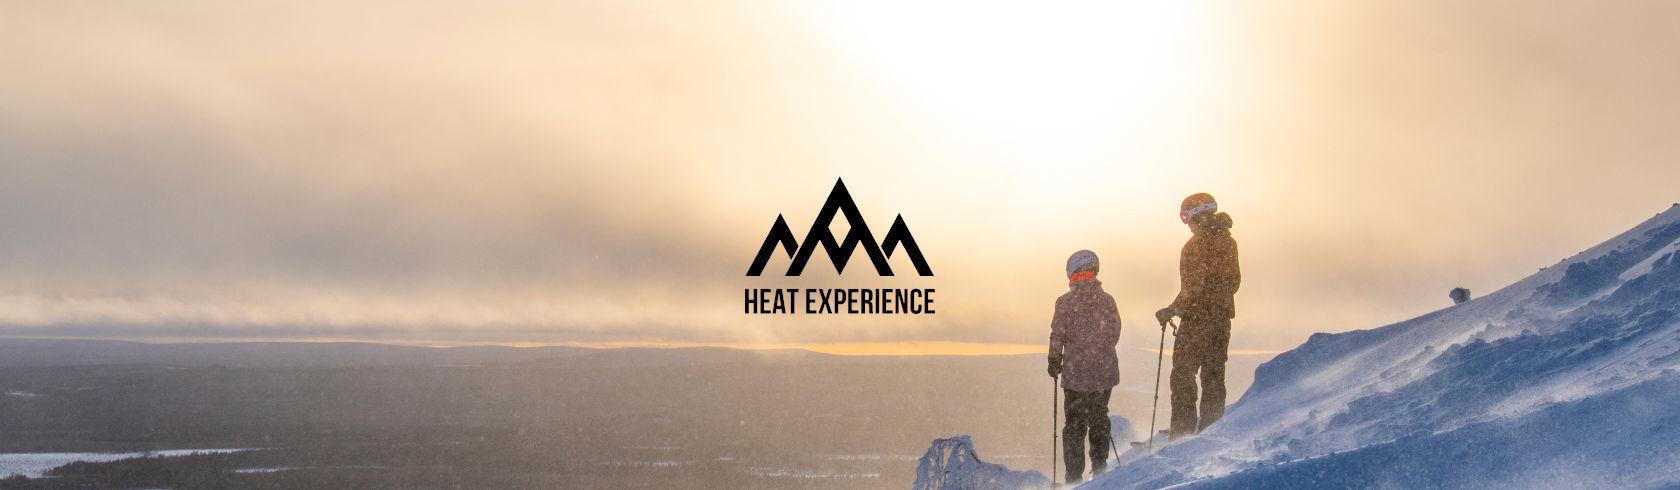 Heat Experience brand logo